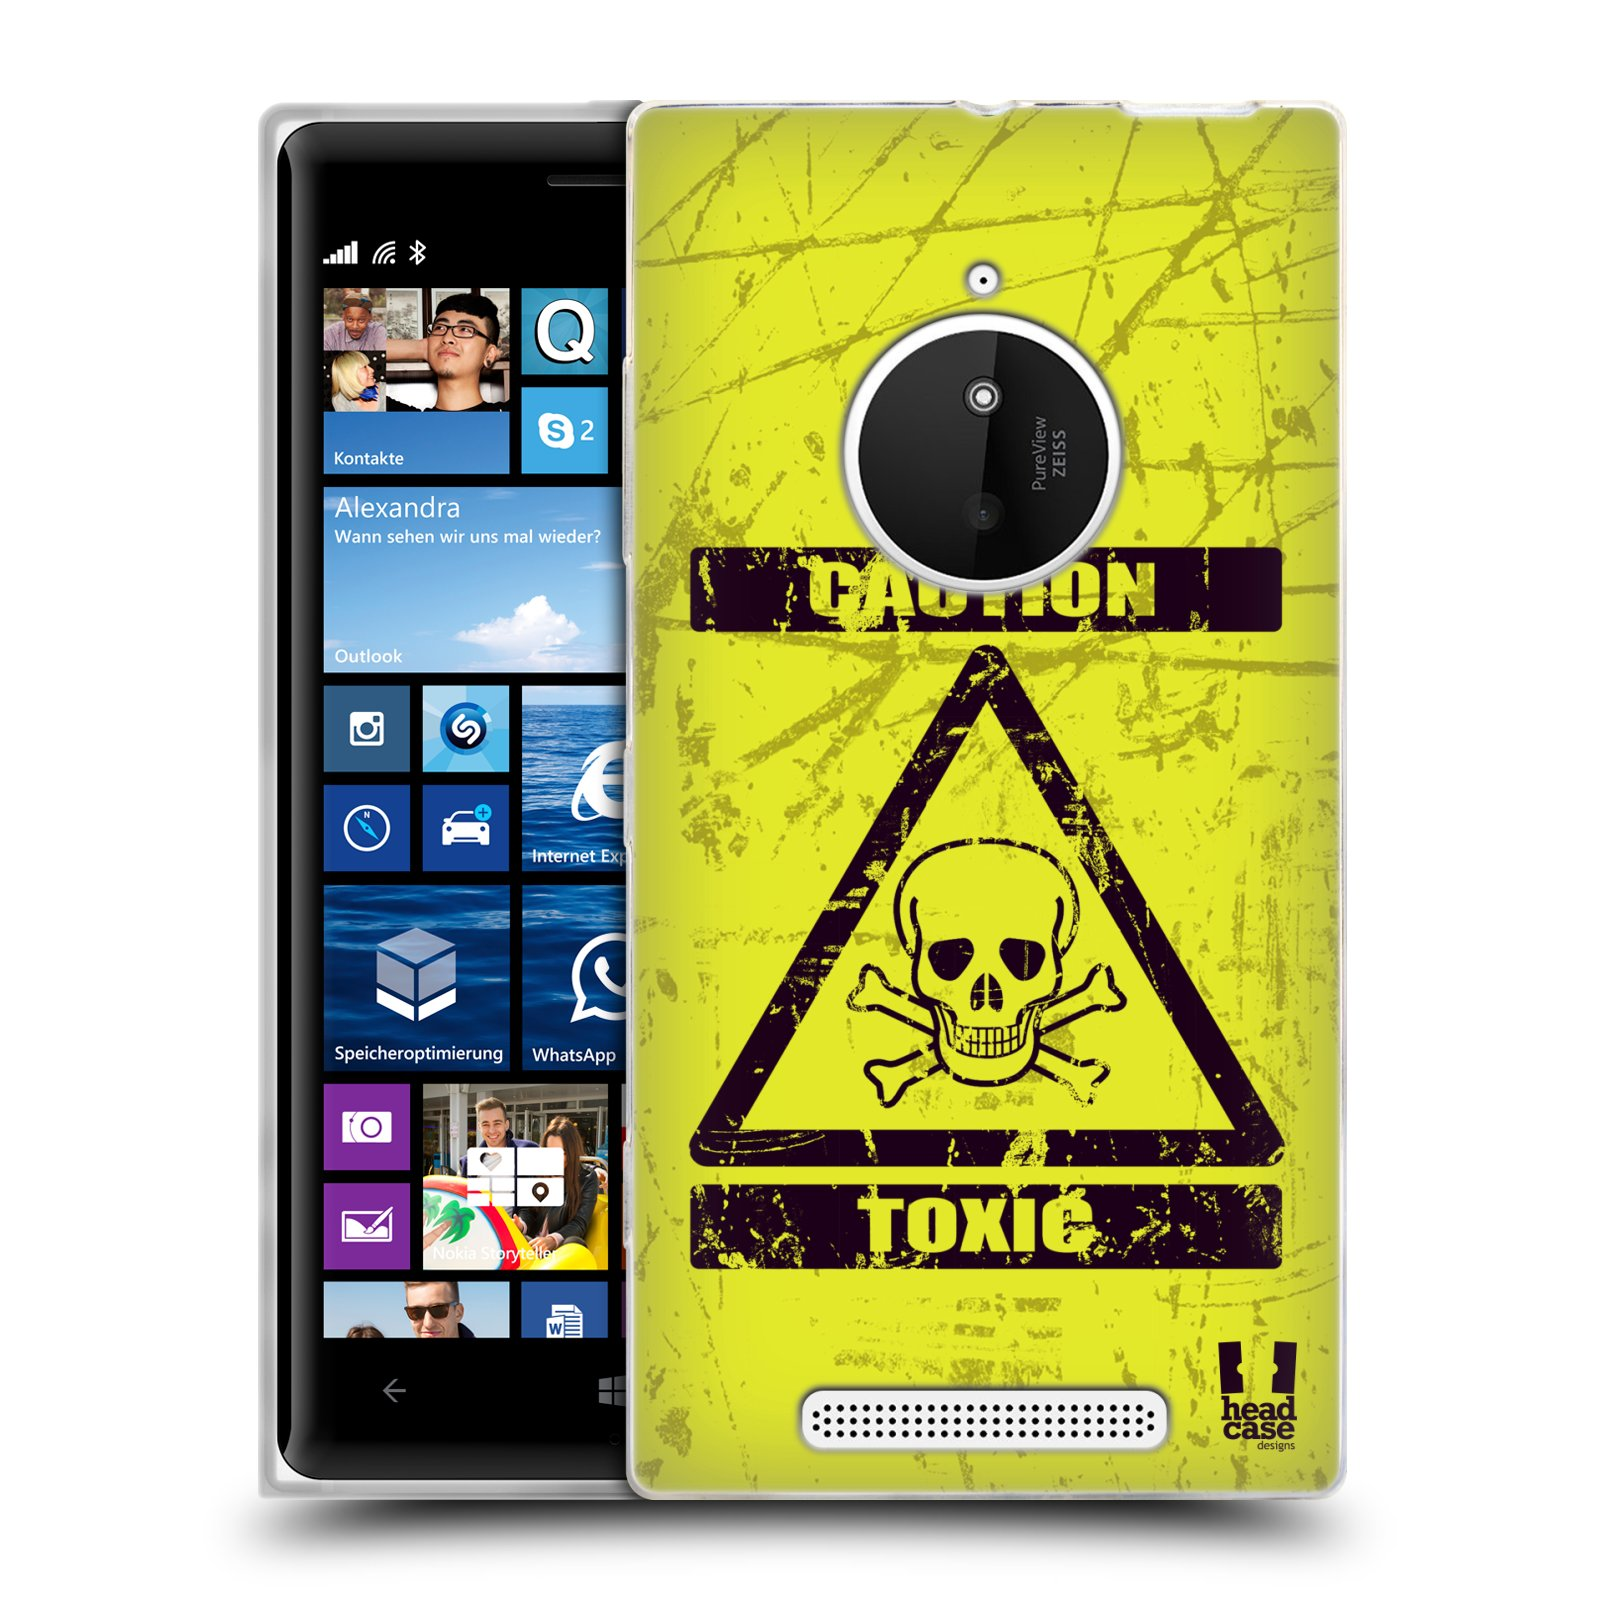 Silikonové pouzdro na mobil Nokia Lumia 830 HEAD CASE TOXIC (Silikonový kryt či obal na mobilní telefon Nokia Lumia 830)